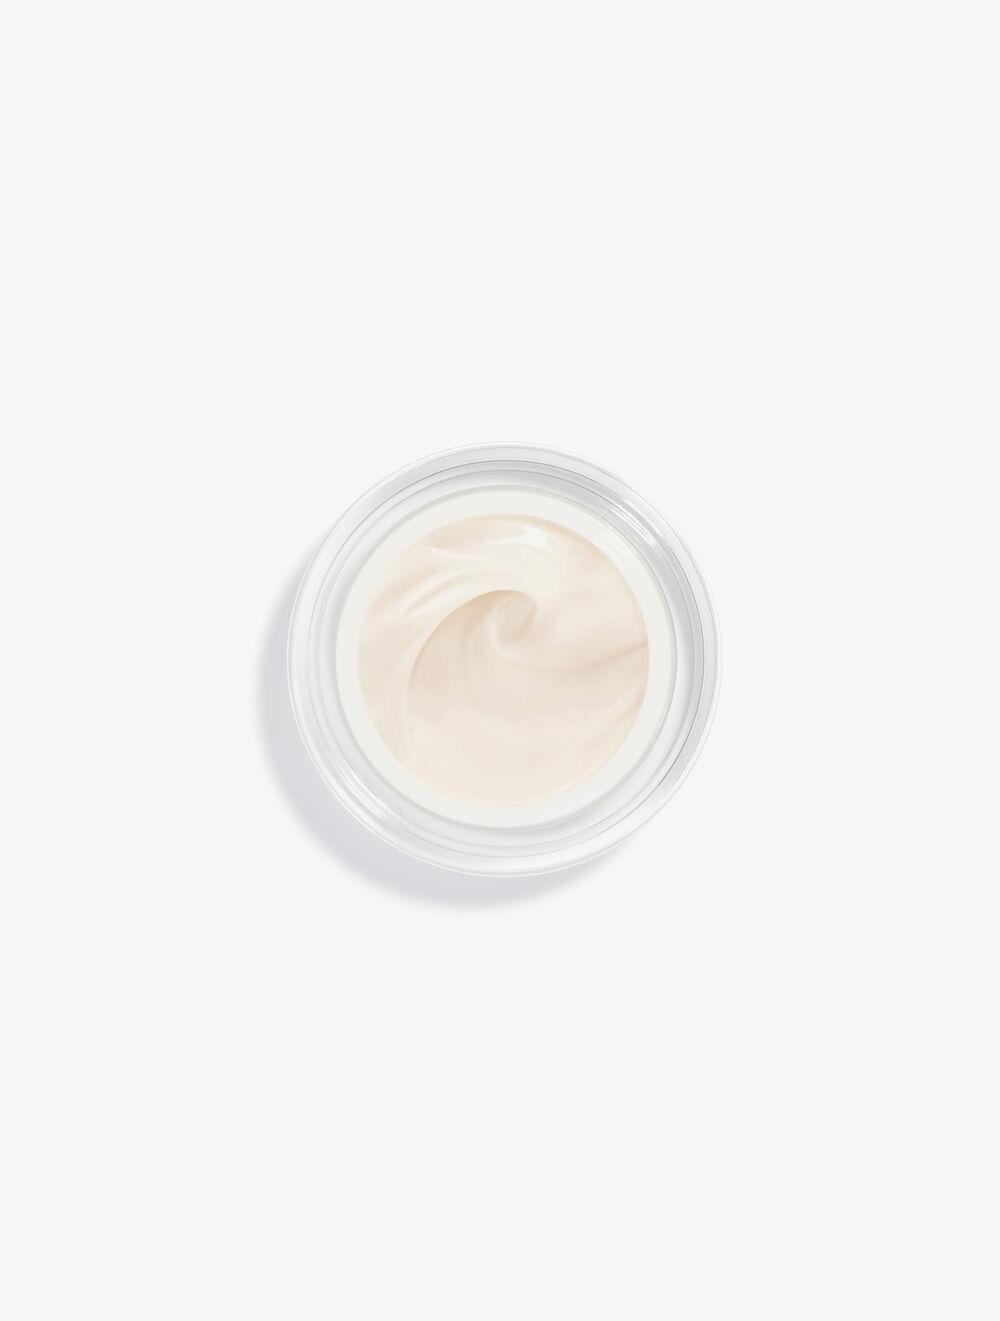 Sisleÿa Eye and Lip Contour Cream